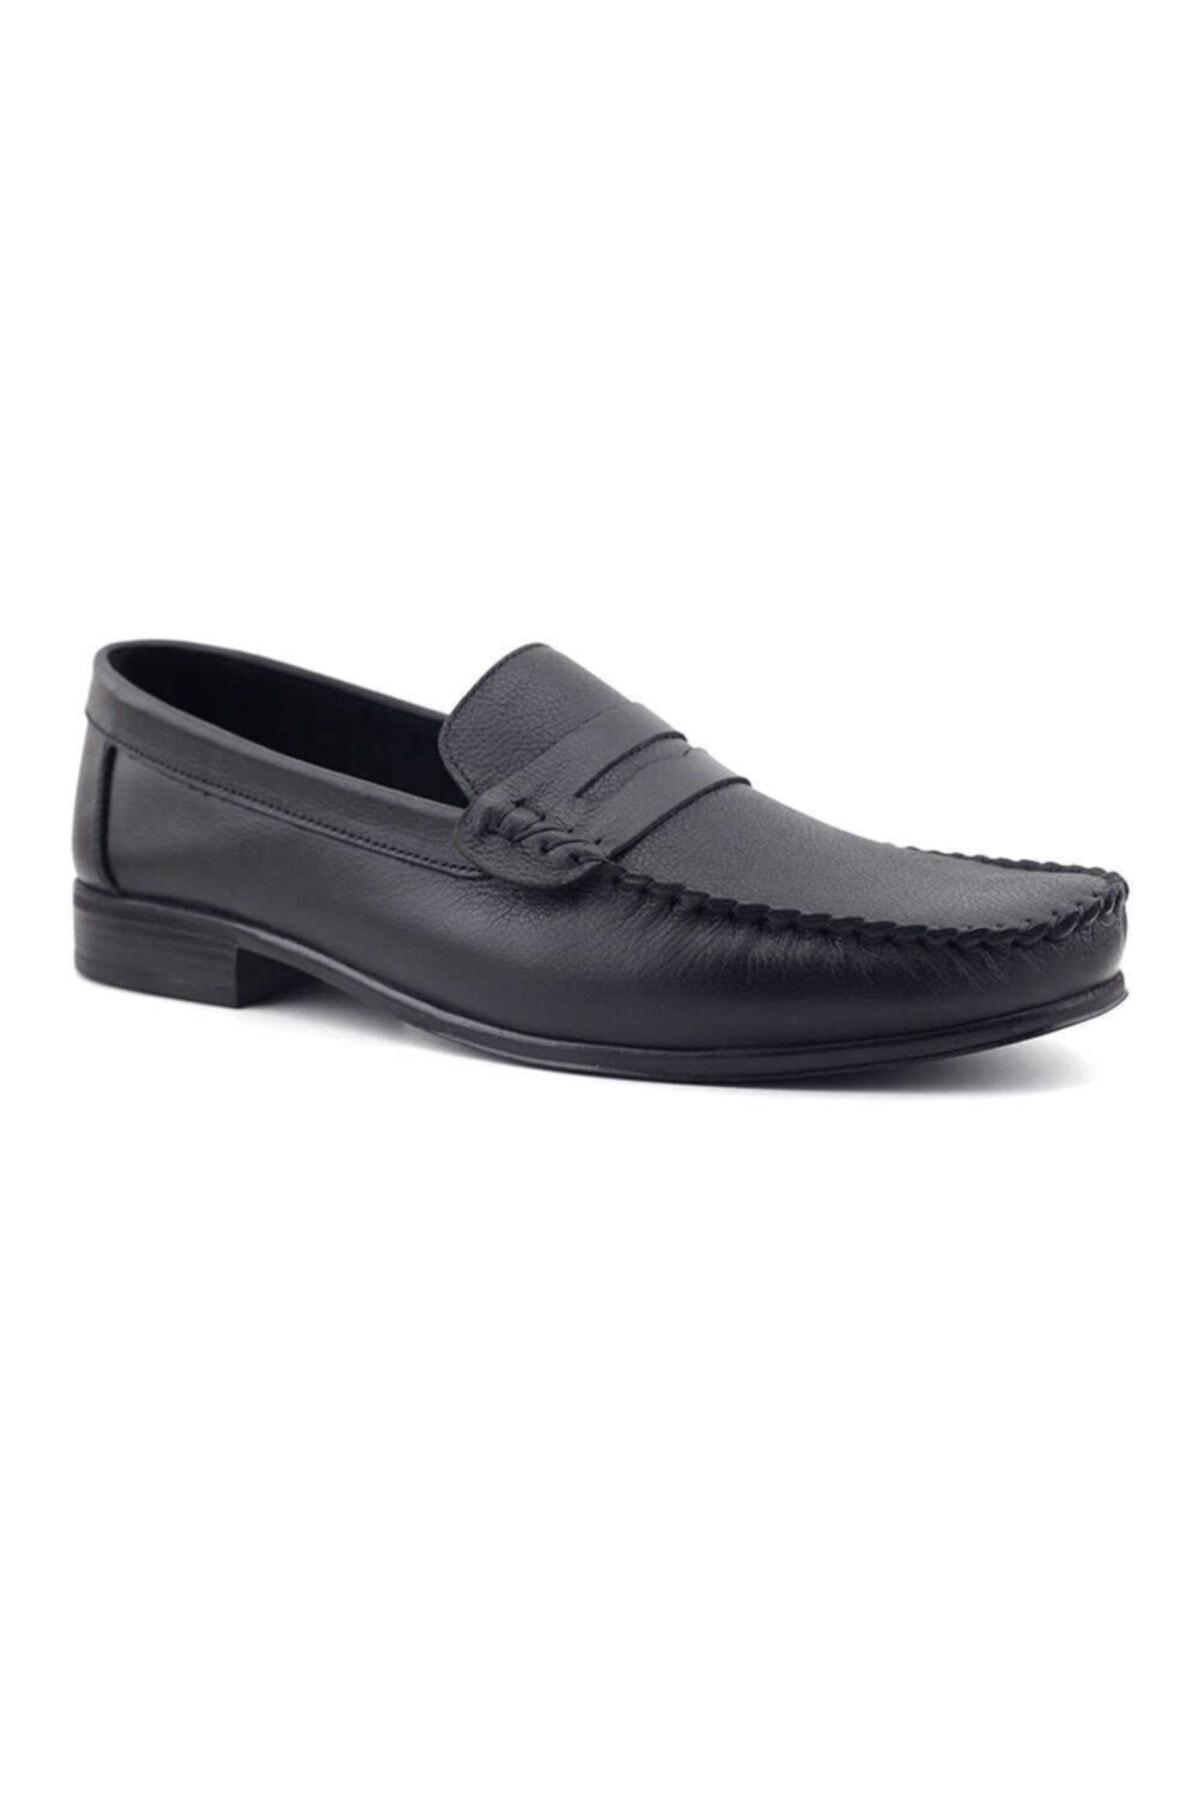 Kayra Catchers 2020 Hakiki Deri Erkek Ayakkabı-siyah 2